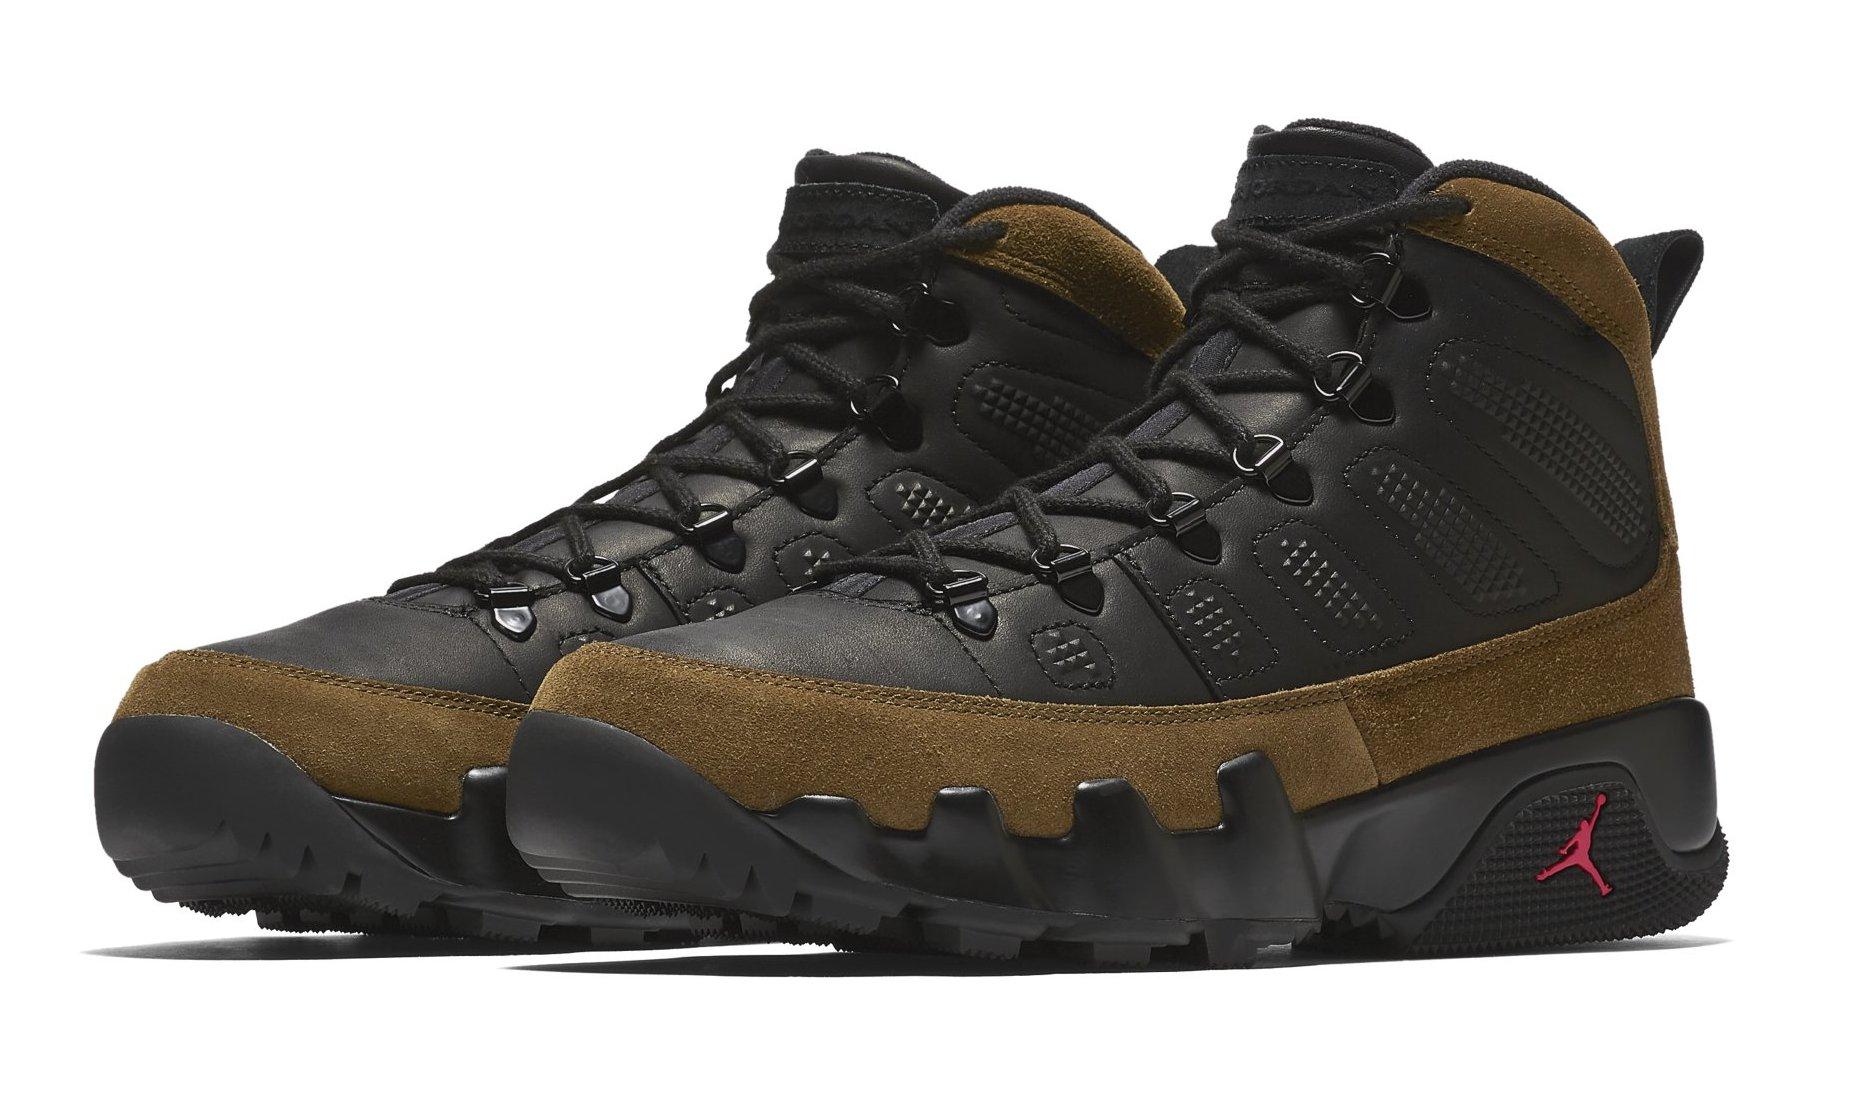 9c77339985d1dc Air Jordan 9 Boot NRG Black True Red Light Olive AO4491-012